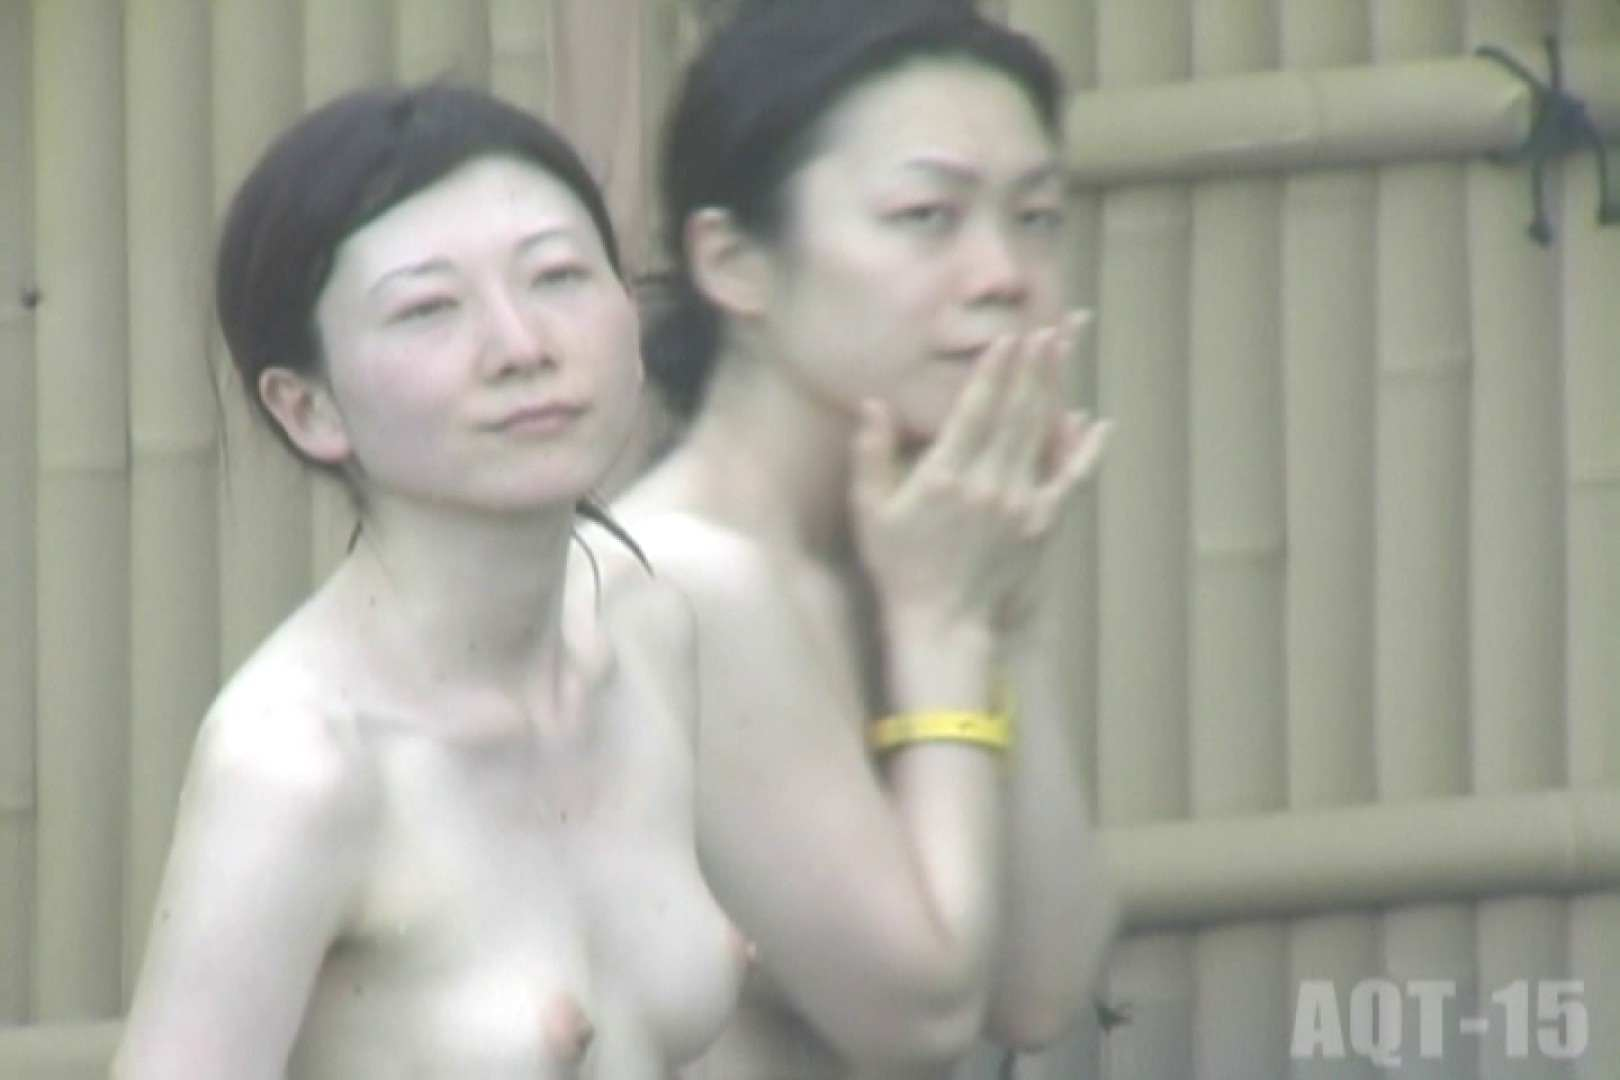 Aquaな露天風呂Vol.835 盗撮 | HなOL  73pic 20